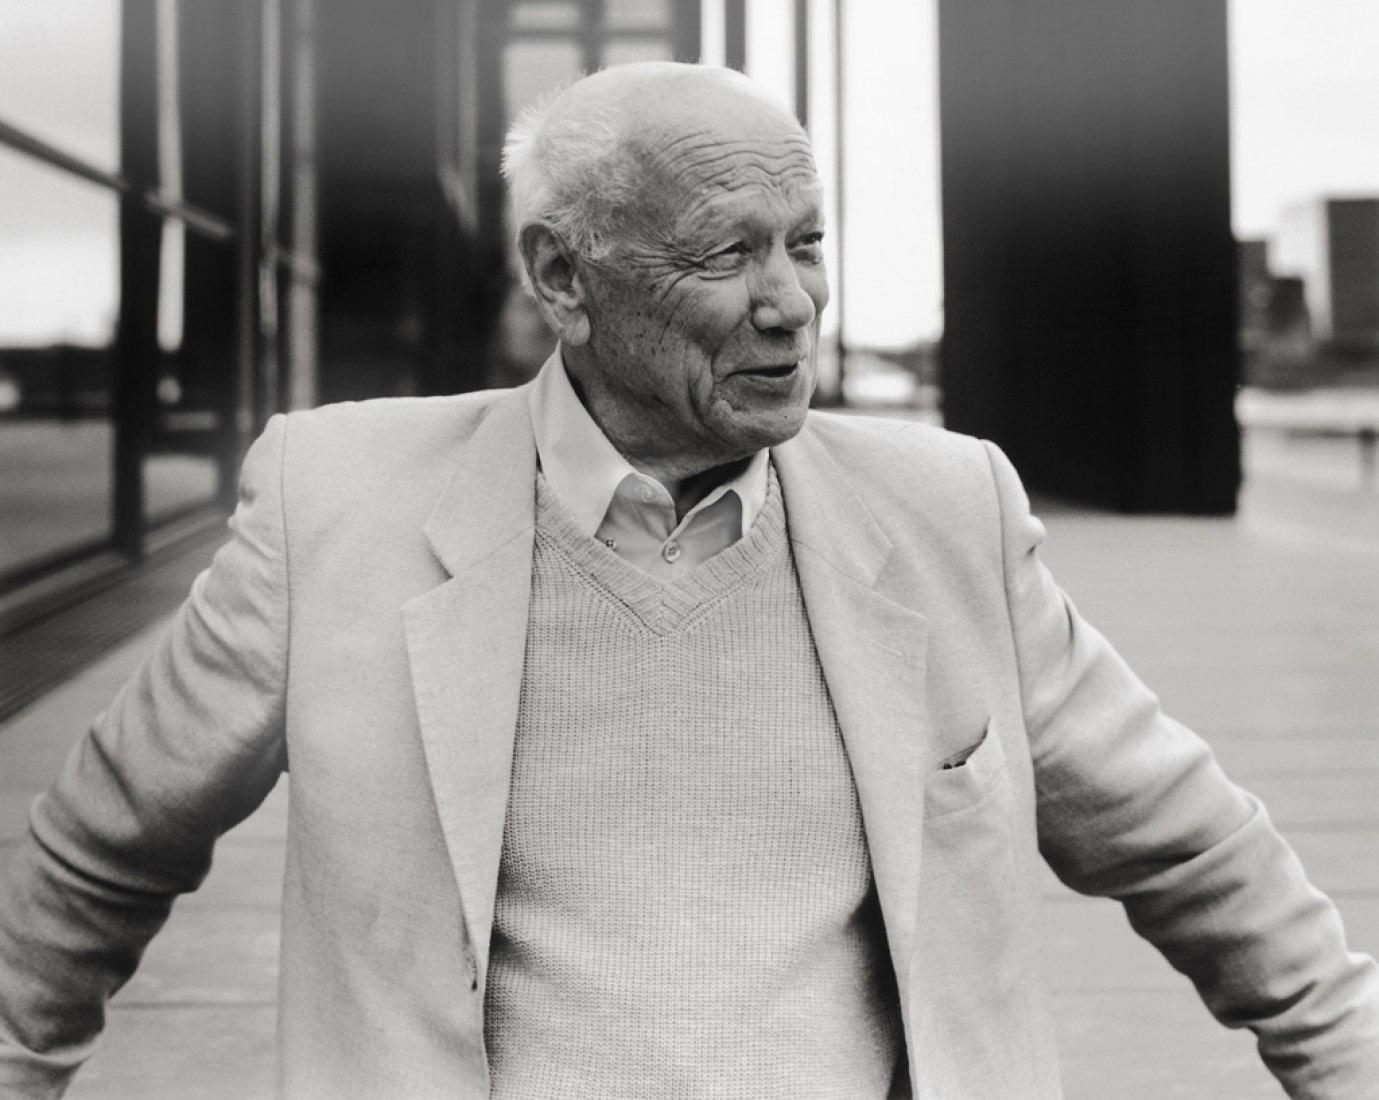 Henning Larsen 1925-2013.